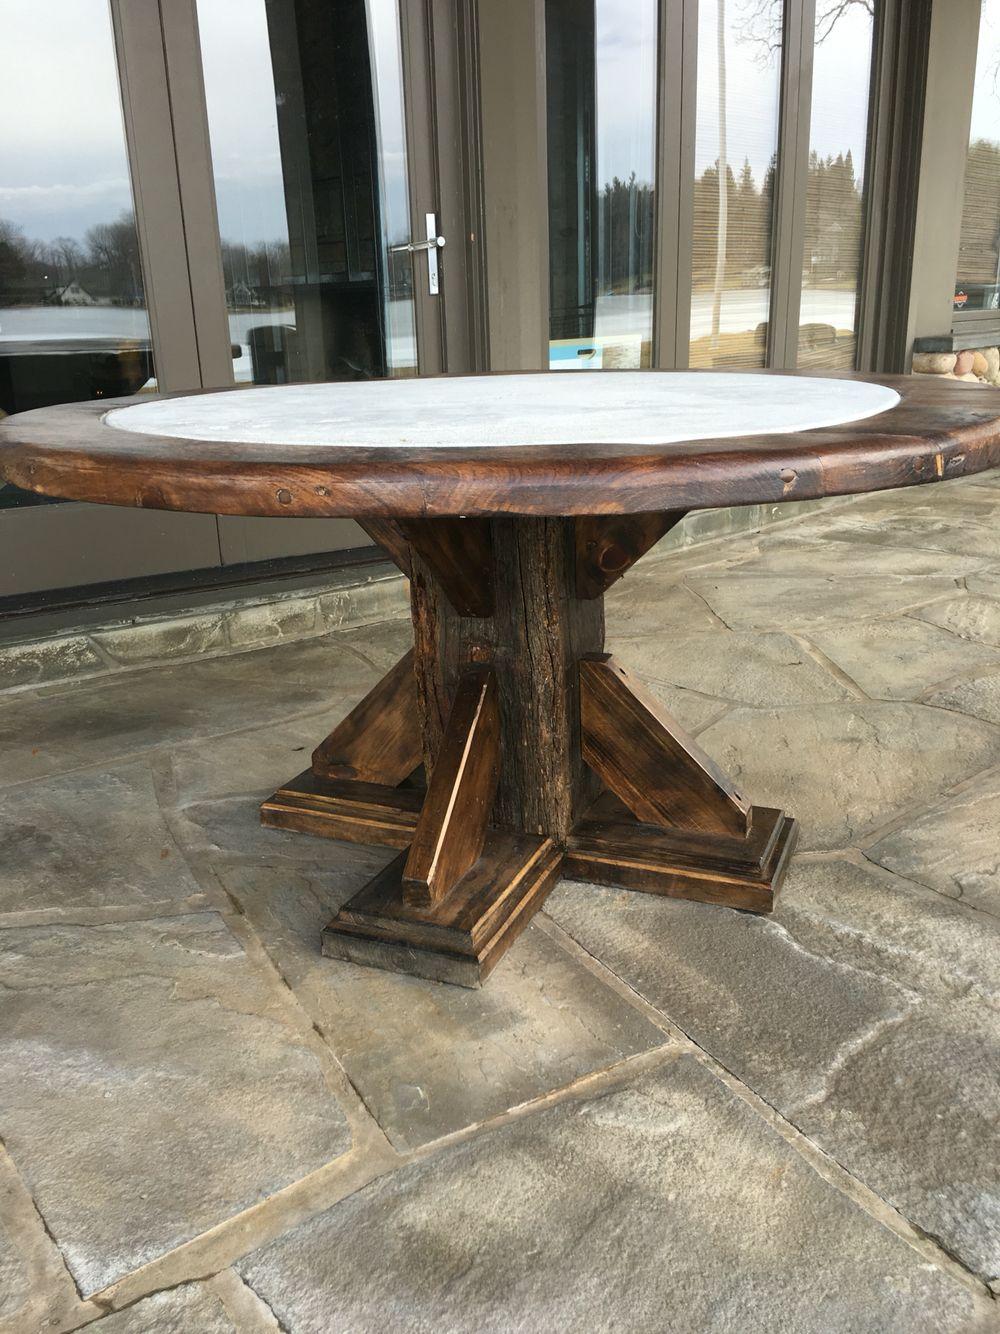 Farmhouse table rustic barn beam round concrete wooden ...